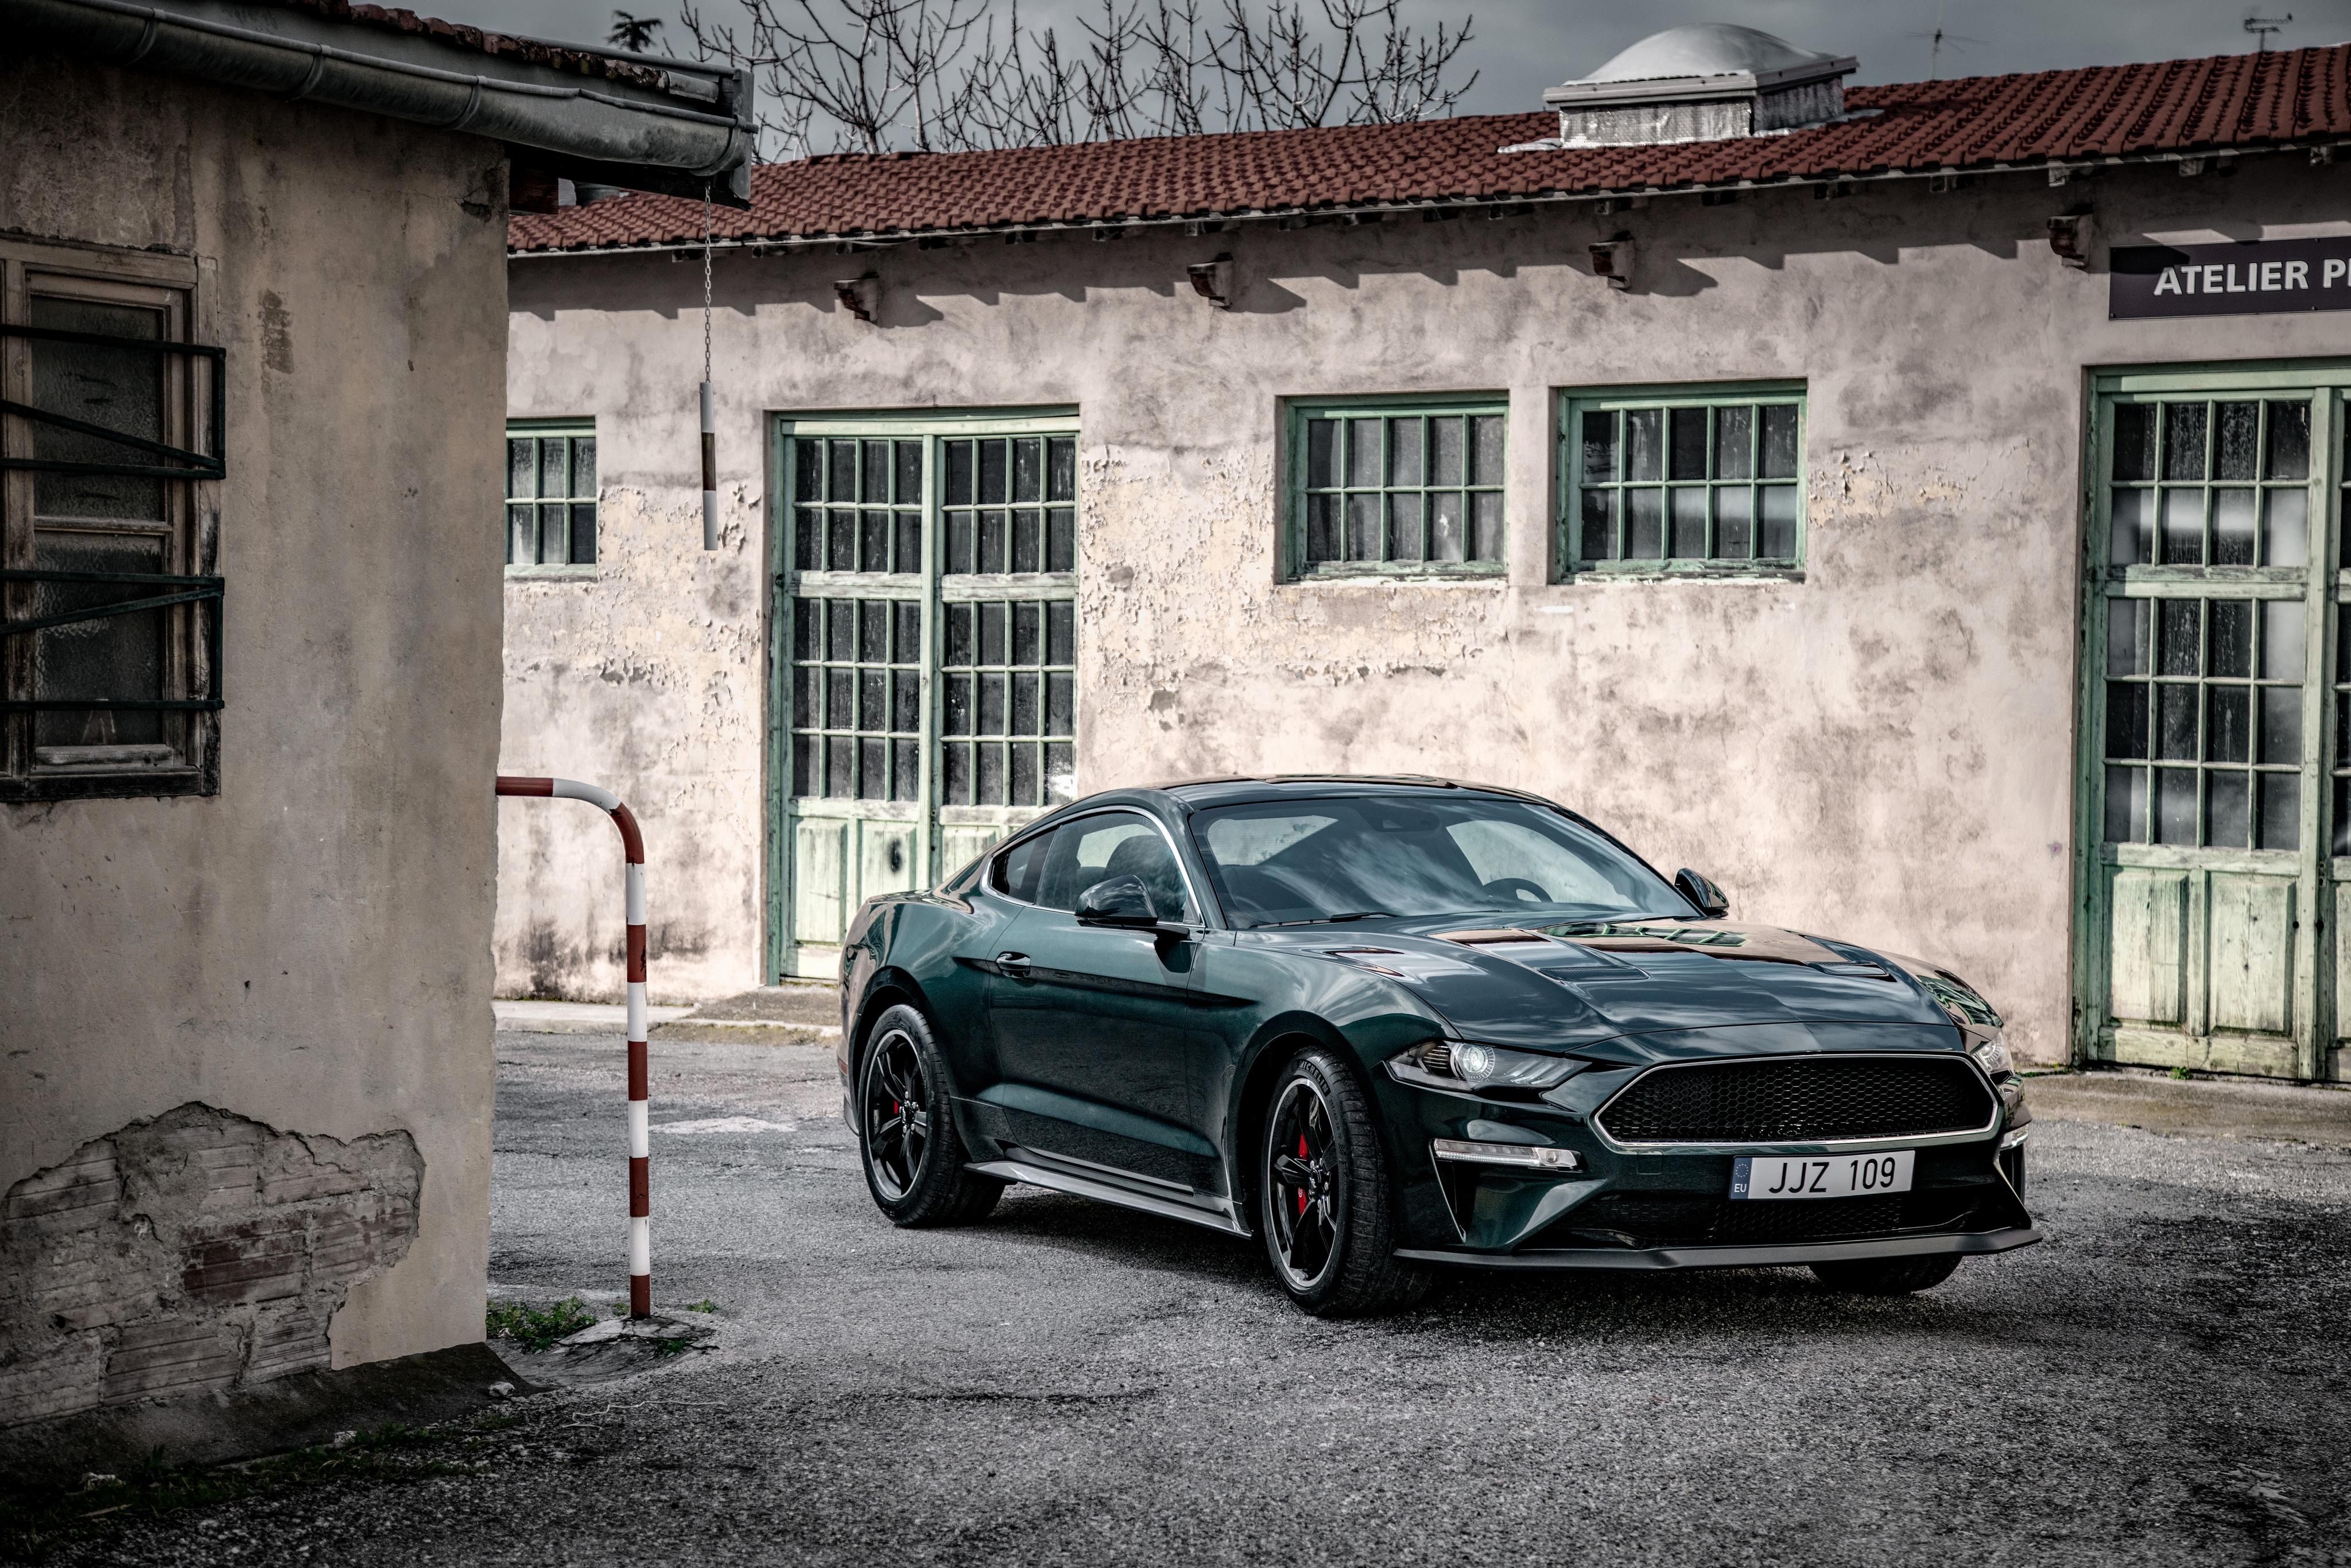 Ford Mustang Bullitt 4k Ultra HD Wallpaper Background Image 4096x2732